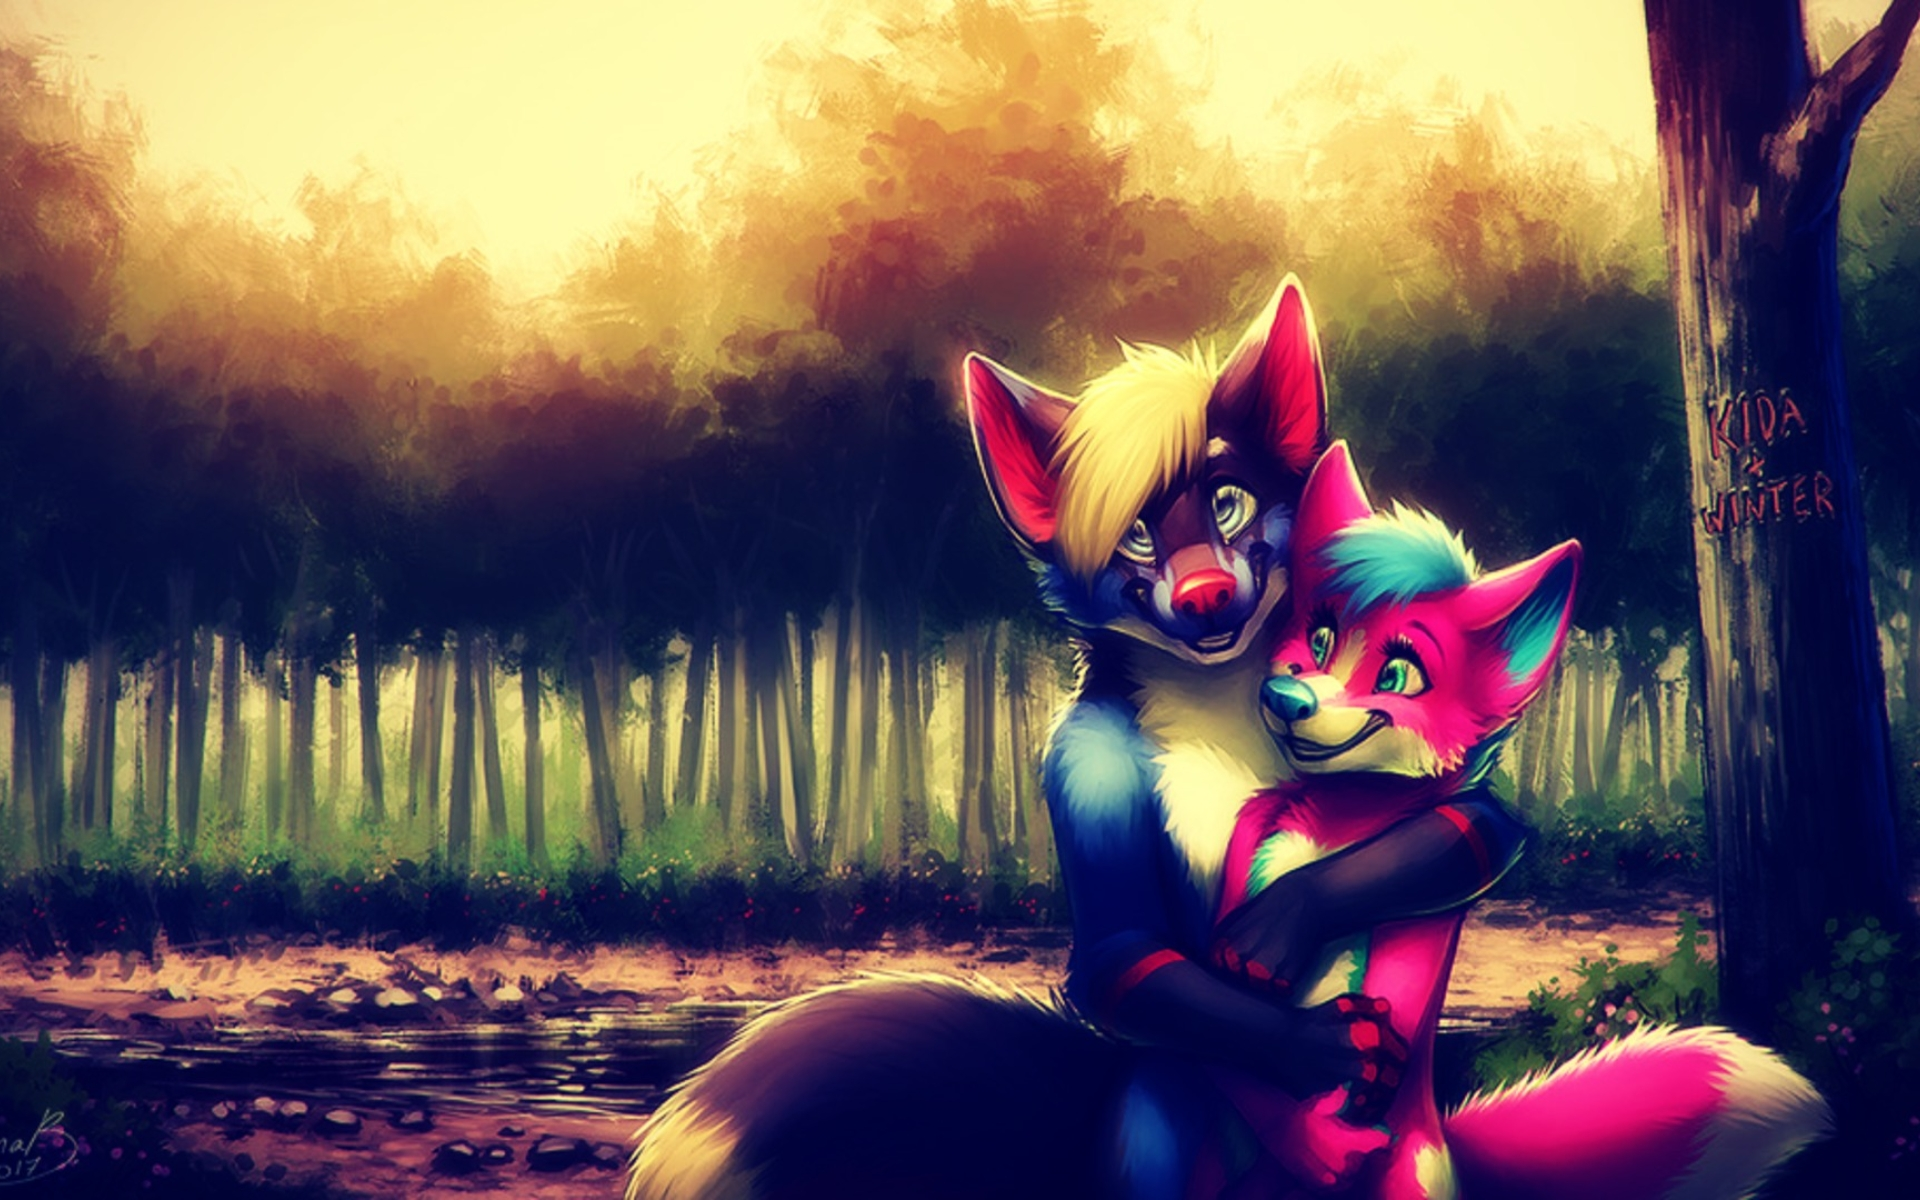 Furry Couple Anime Art Full Hd Wallpaper